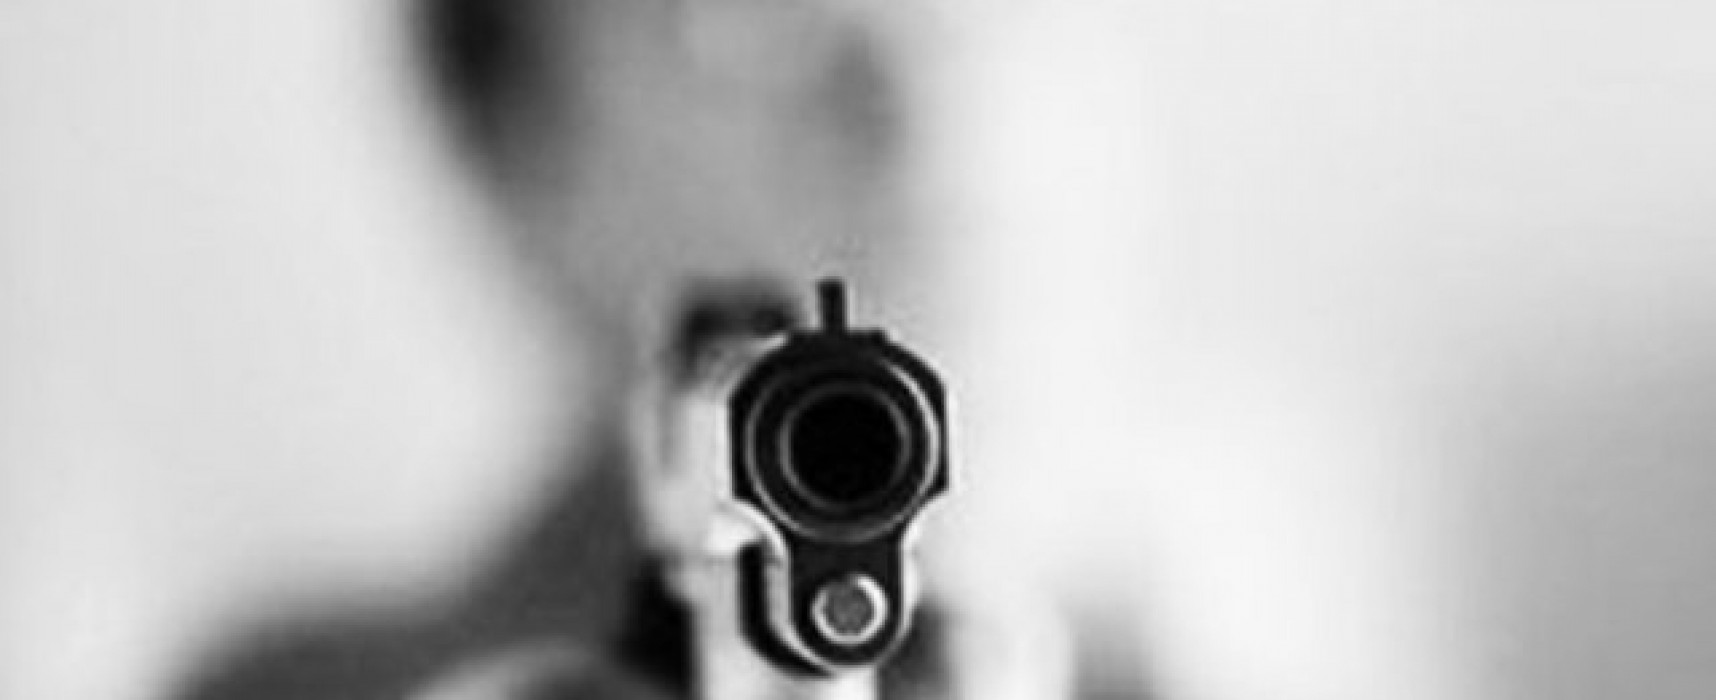 http://idealmt.com.br/wp-content/uploads/2015/02/revolver.jpg